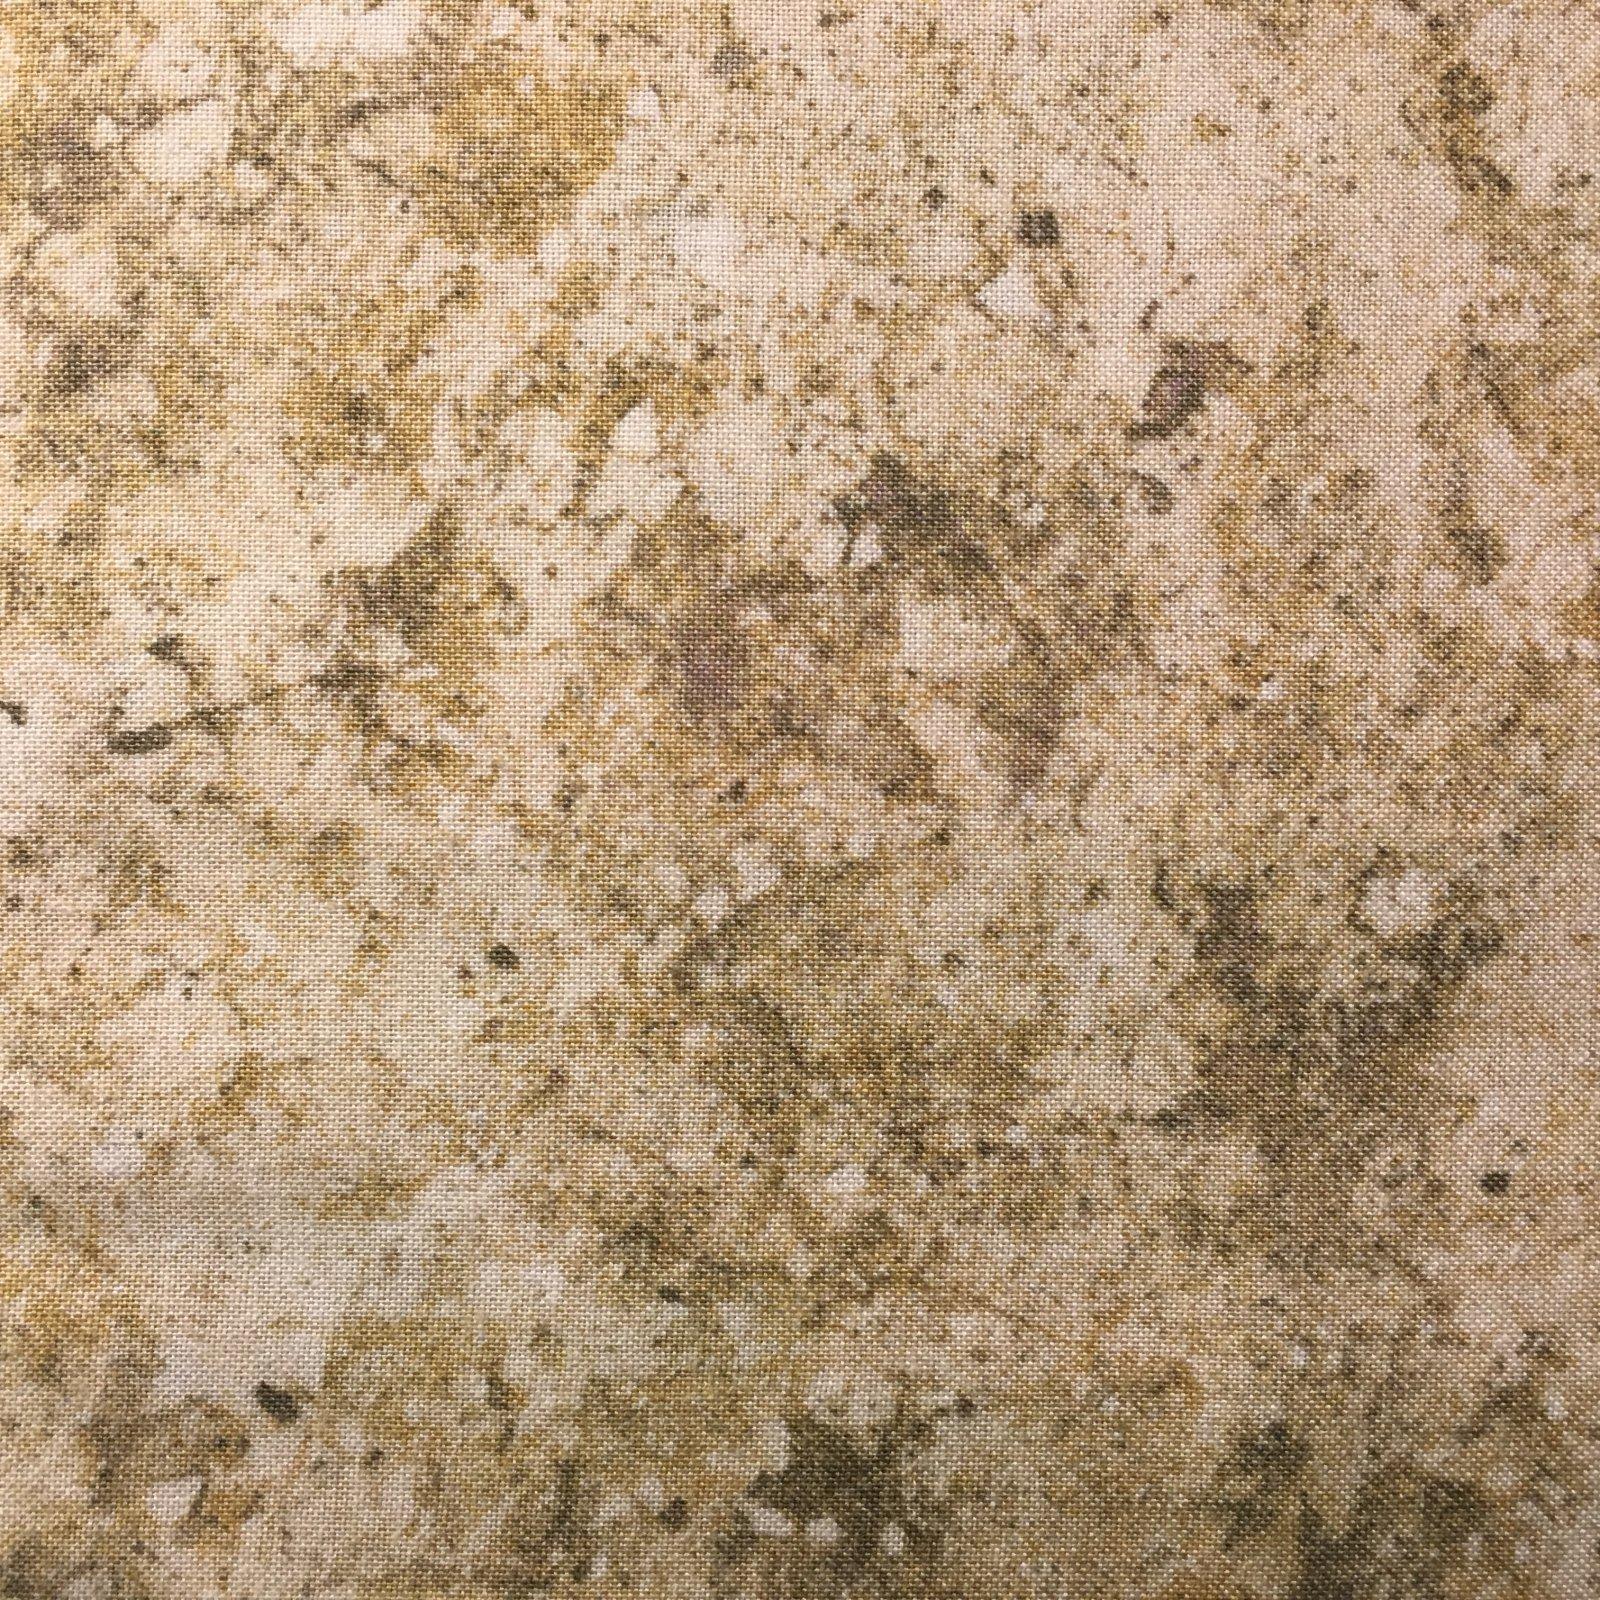 Northcott Stonehenge 3954 149